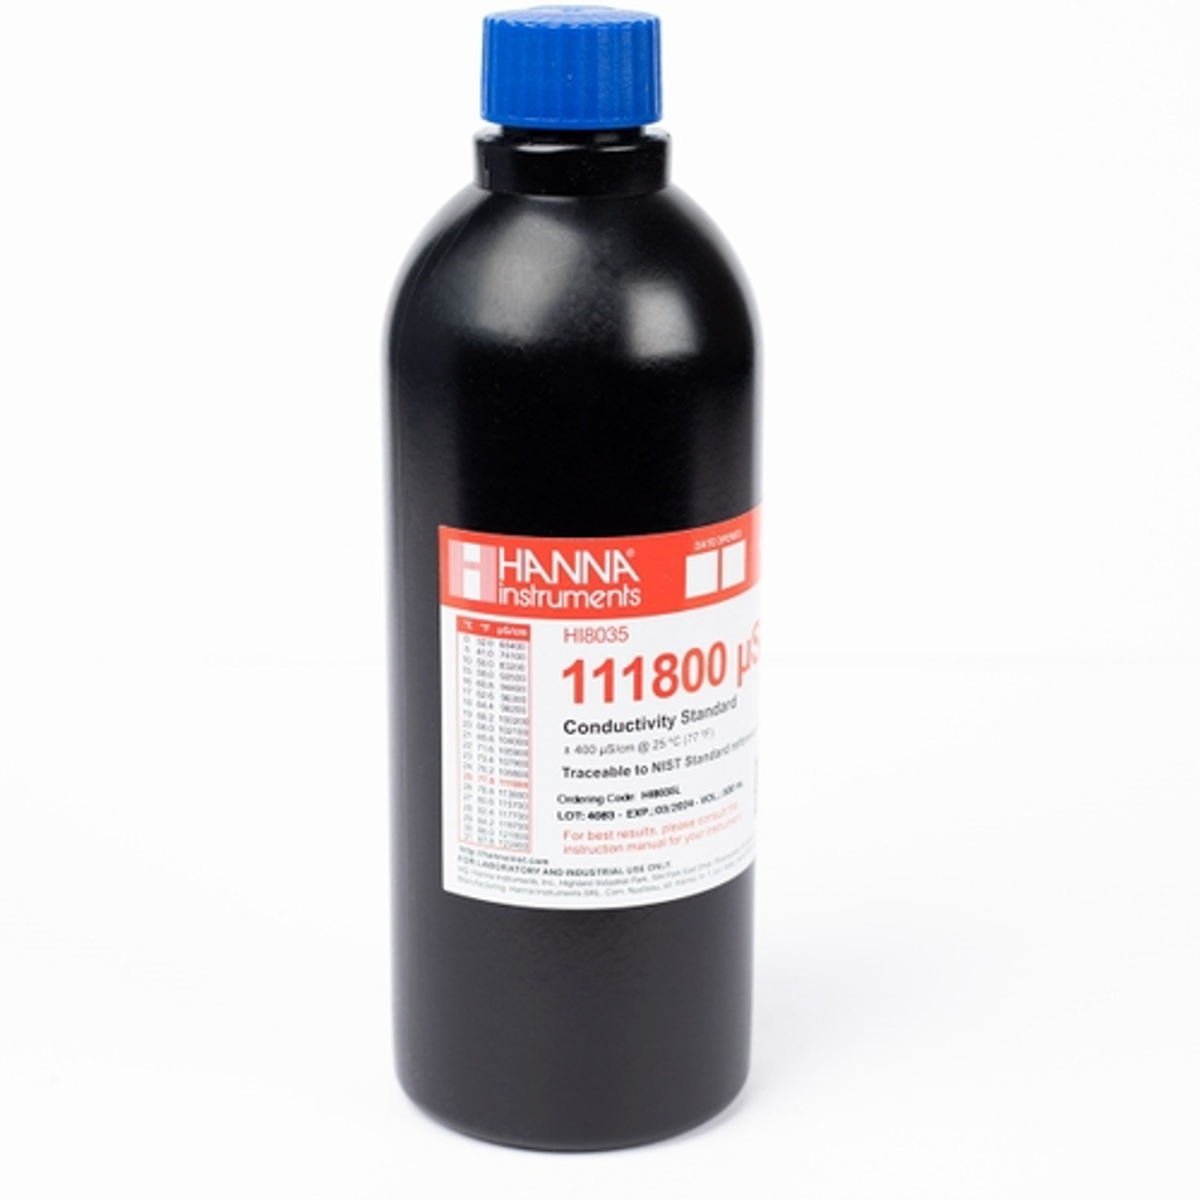 HI8035L 111800 µS/cm Conductivity Standard in FDA Bottle (500mL)